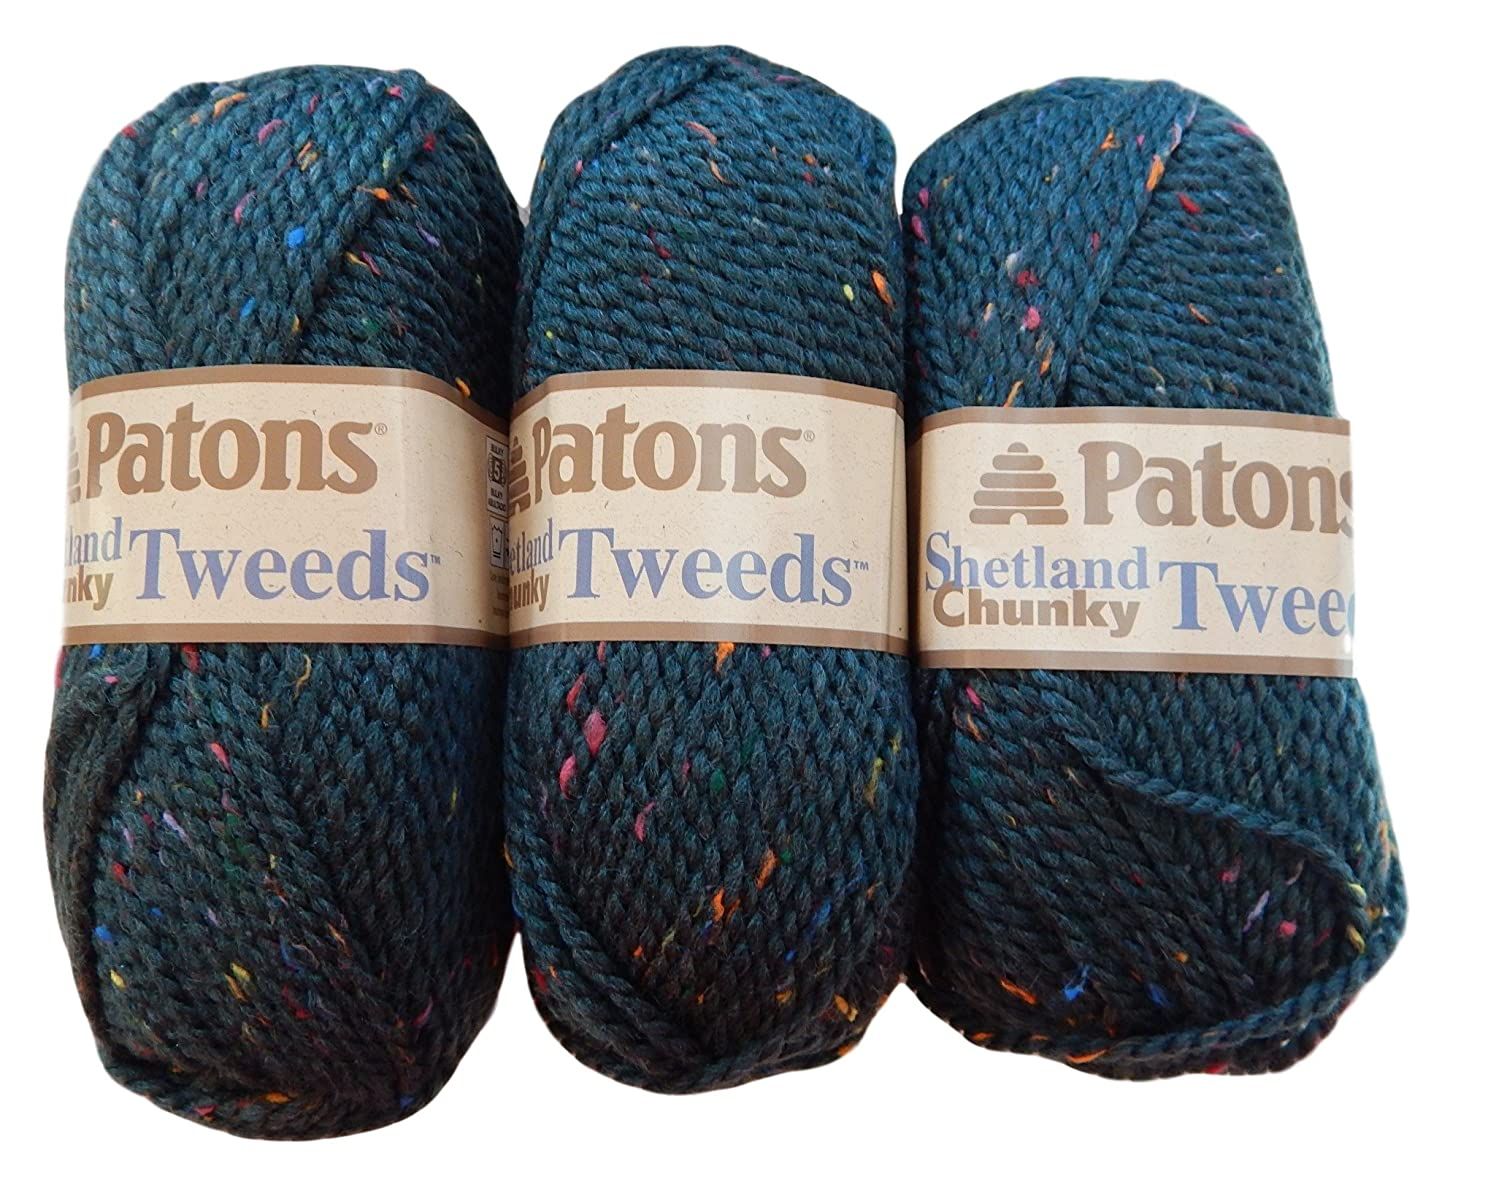 Patons Shetland Chunky Tweed Yarn Bundle ( 3 Pack) Bulky Acrylic Wool Blend, green, blue